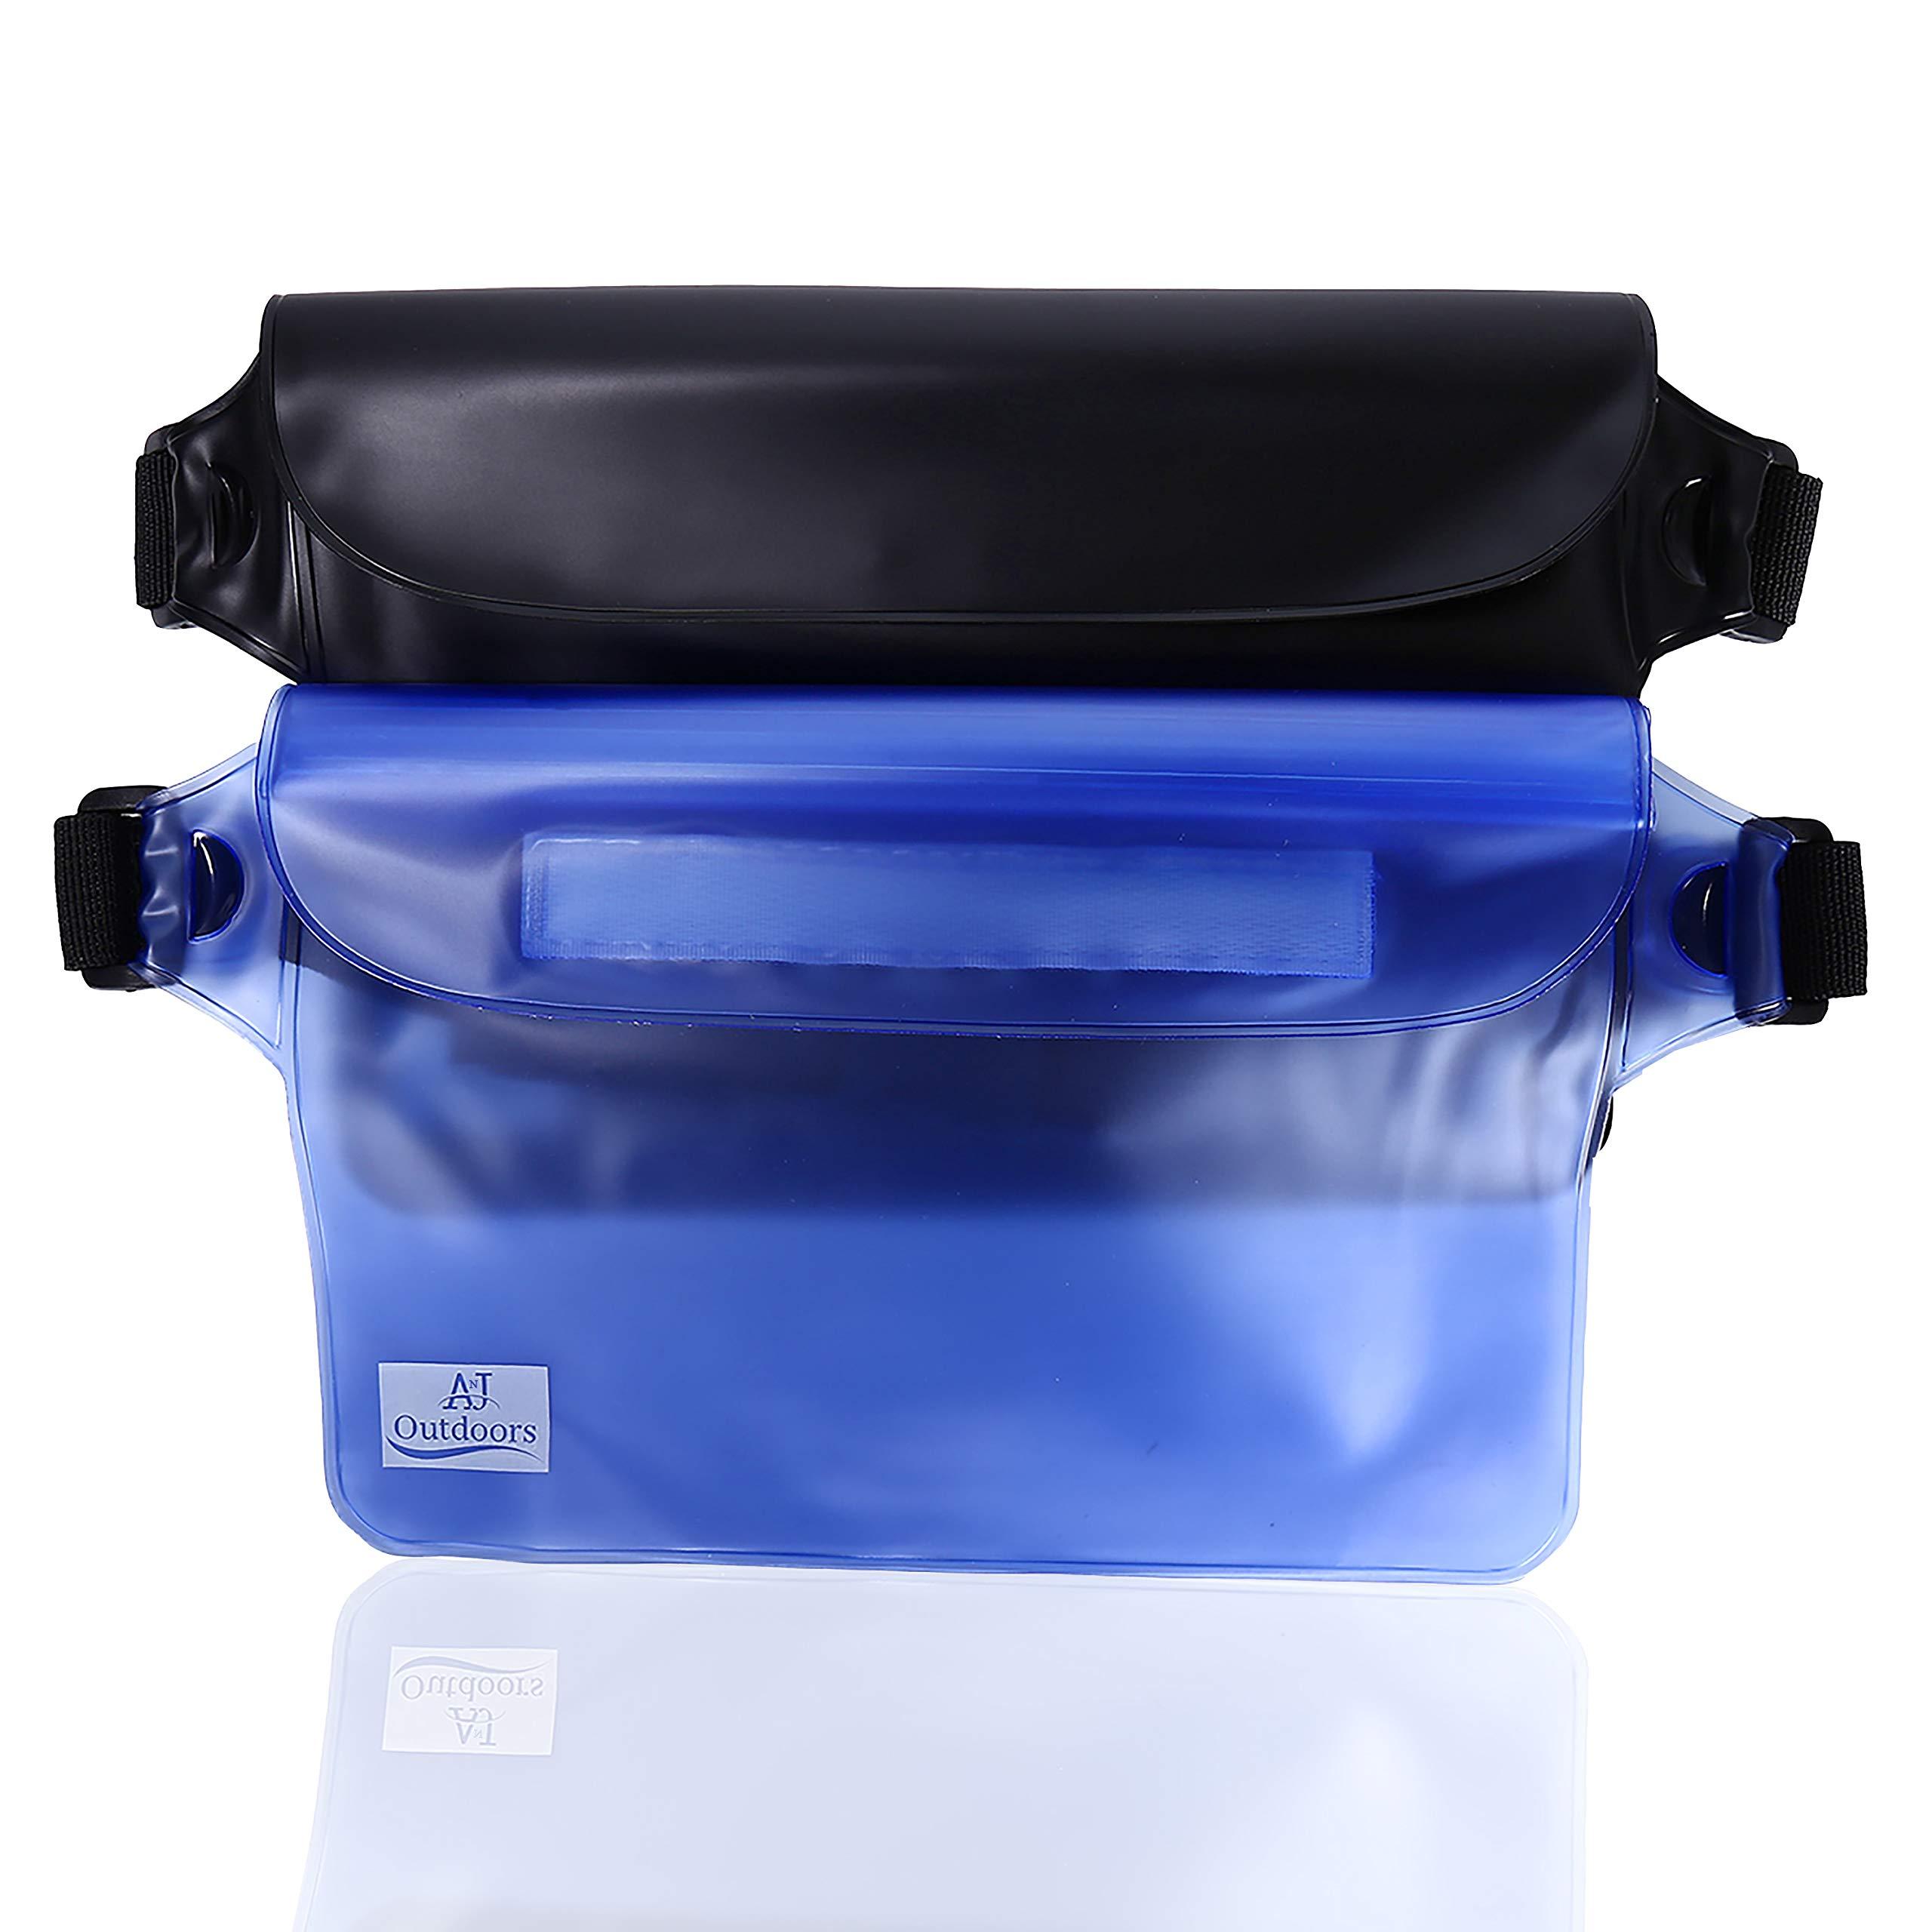 ANJ Outdoors 3-Zipper Design, The Most Durable 2PK Waterproof Pouch/Waterproof Bag   Adjustable Waist Strap   Ideal Waterproof Phone Case/Waterproof Wallet for Boating and Fishing…